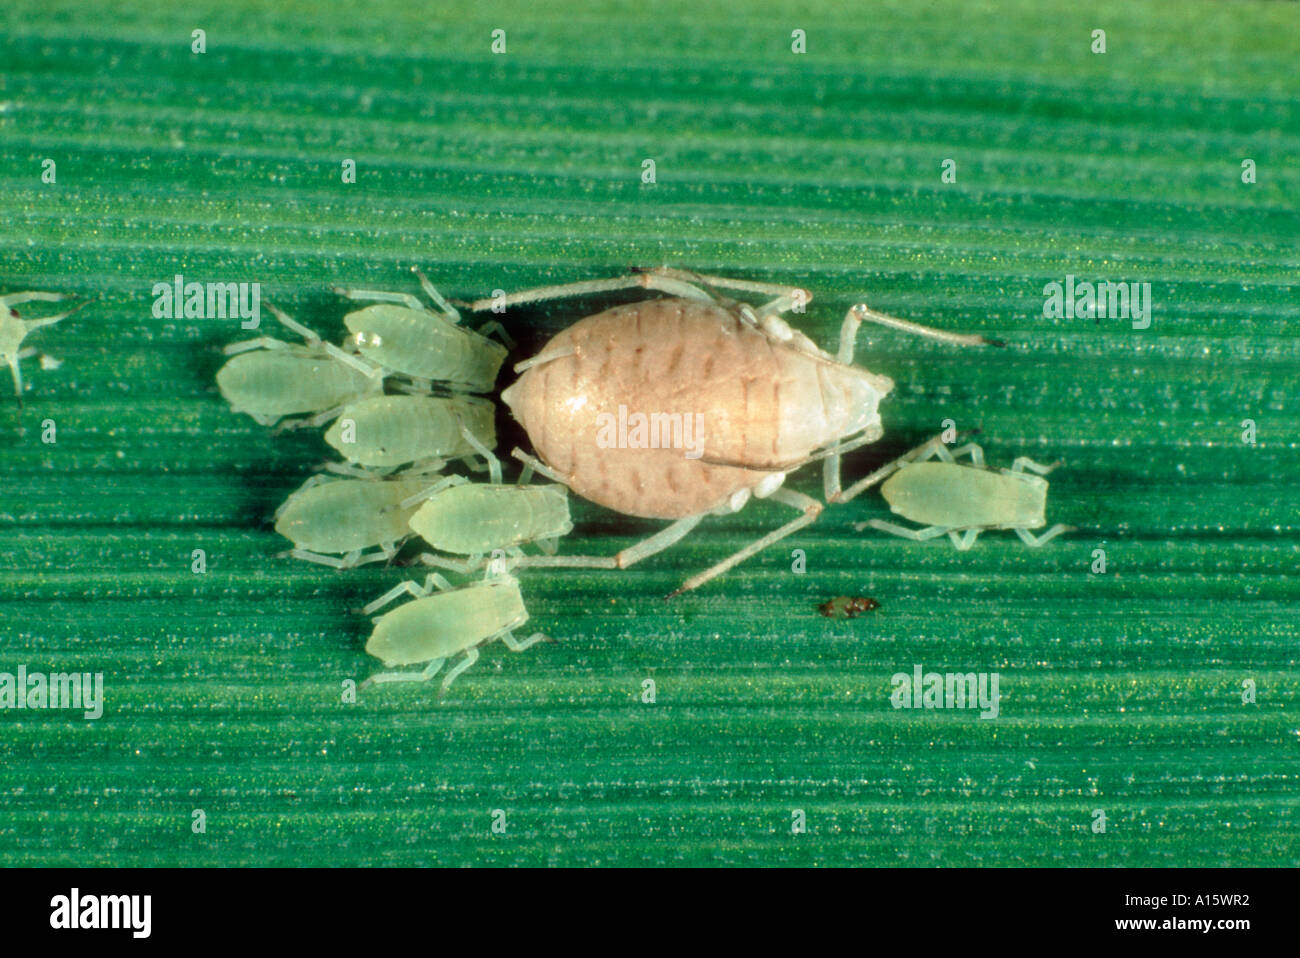 Rose grain aphid Metapolophium dirhodum parasitised and mummified by an Aphidius sp wasp - Stock Image